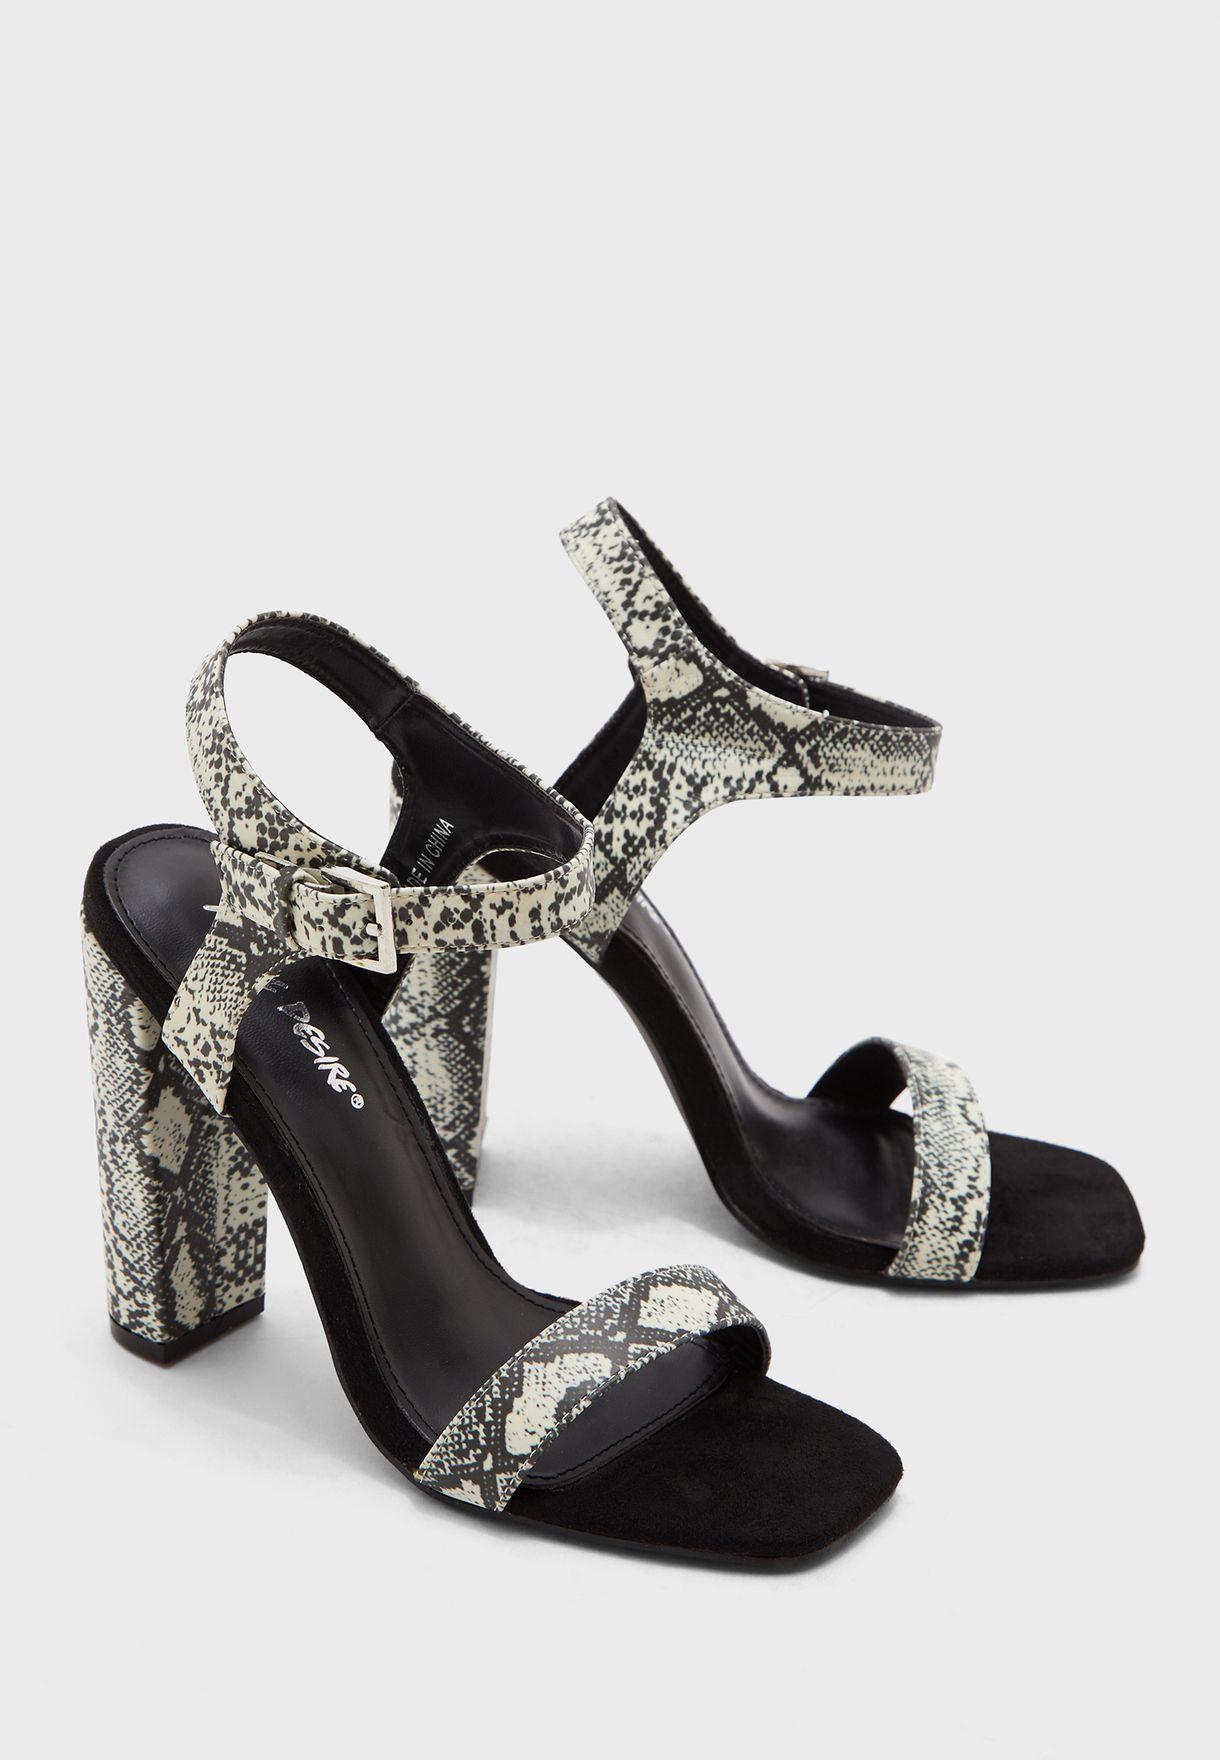 Meteor Ankle Strap Sandal - Snakeskin